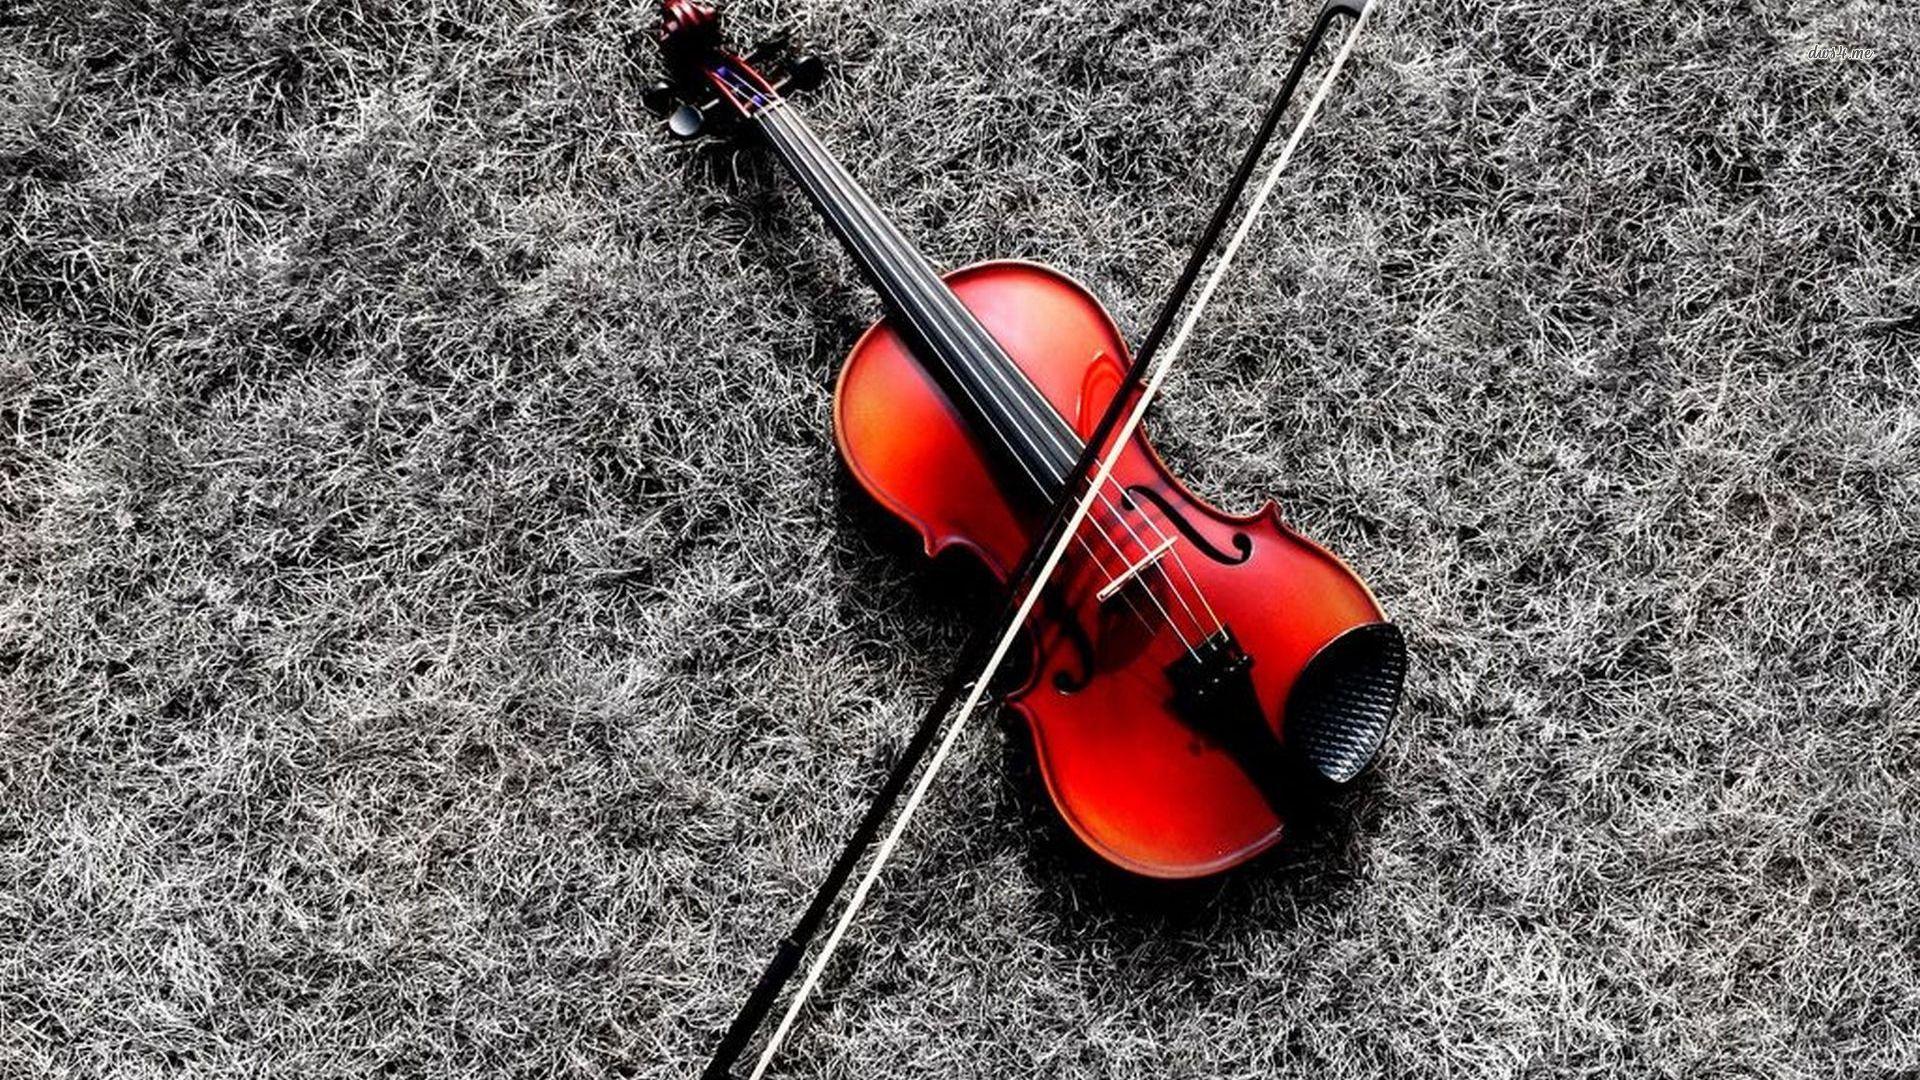 Violin Wallpaper: 4K Violin Wallpapers High Quality